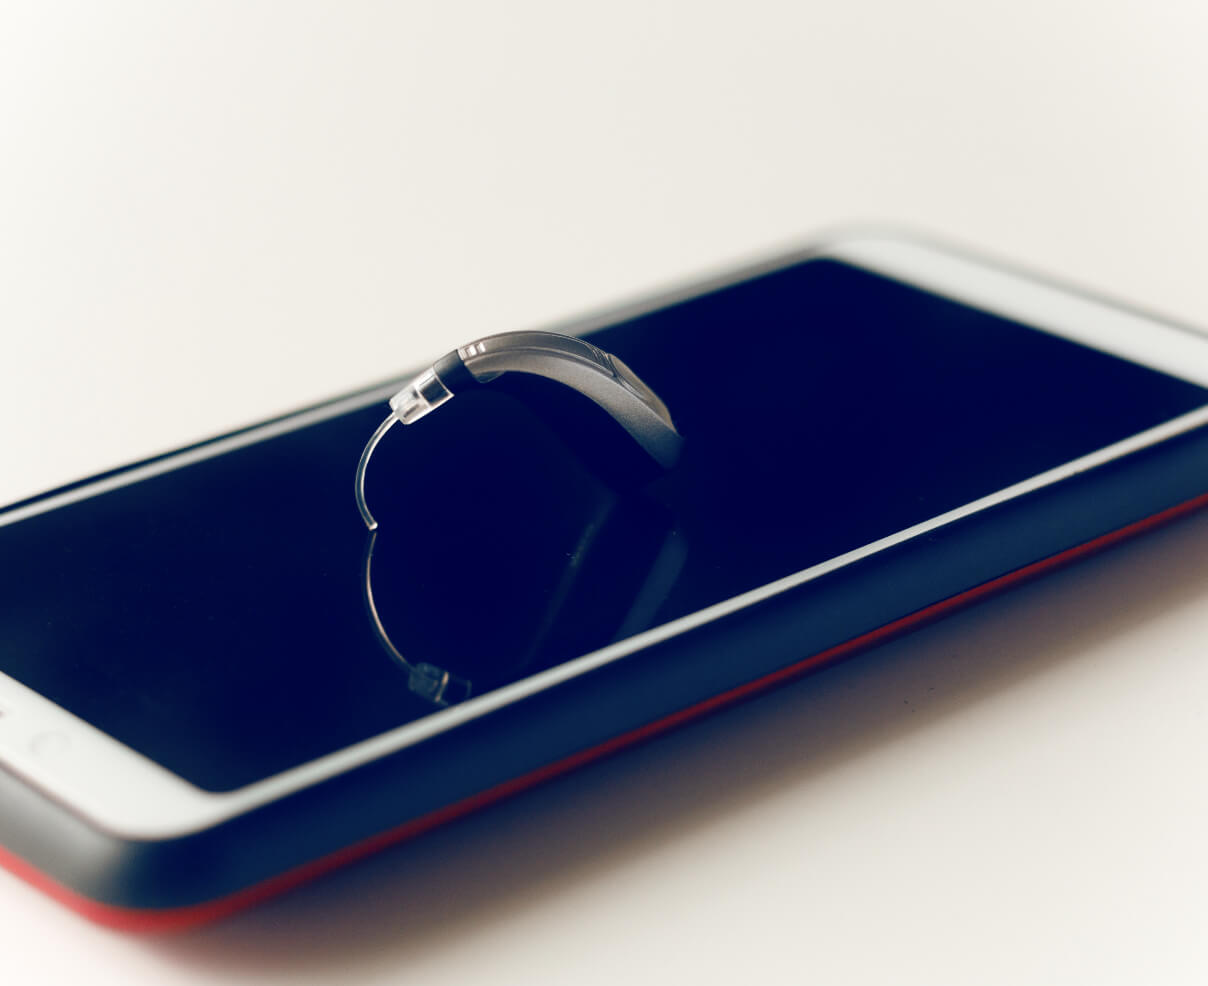 Hörgeräte Iphone Schwarz